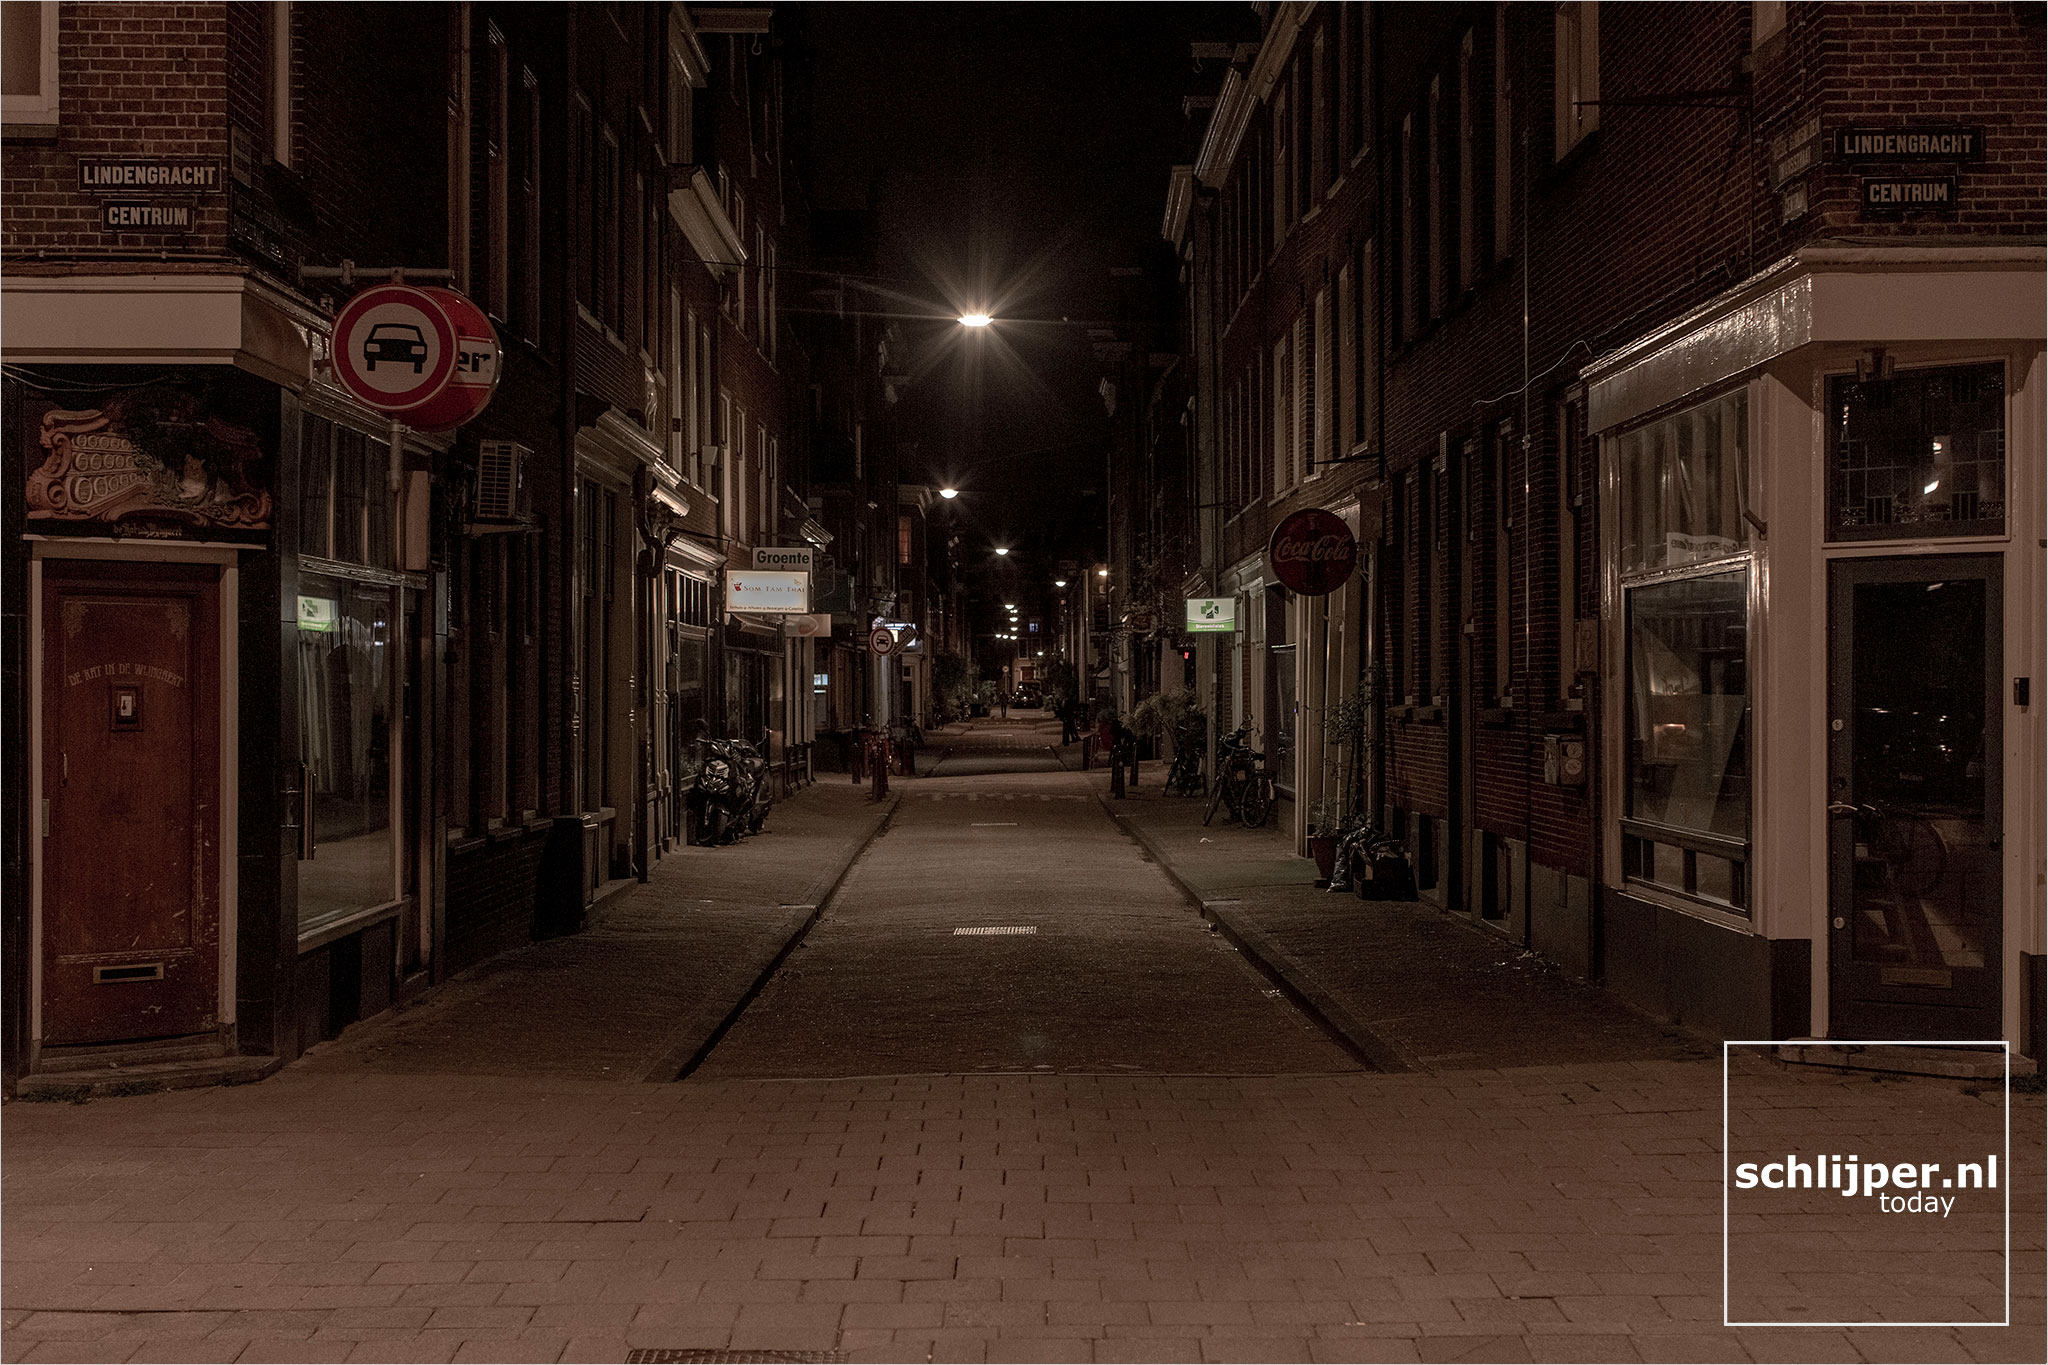 The Netherlands, Amsterdam, 10 mei 2021